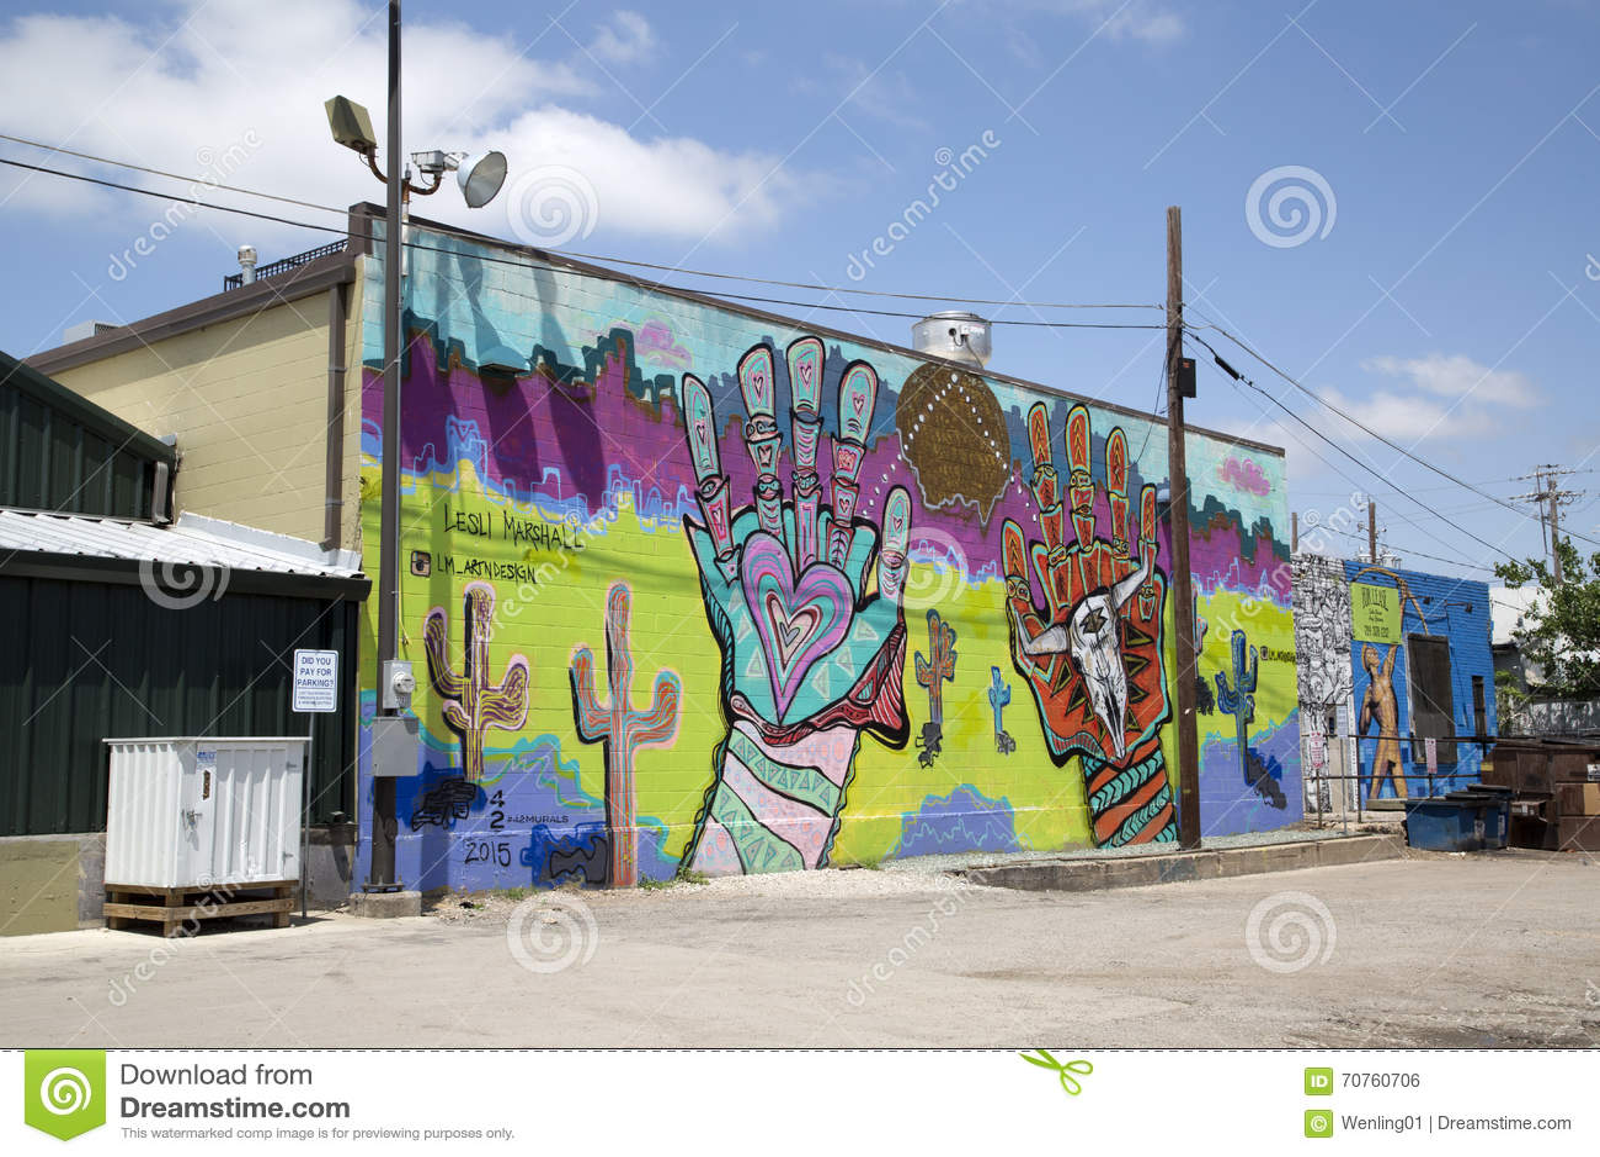 Graffiti wall dallas - Group Colorful Graffiti On The Wall Of Building Royalty Free Stock Image